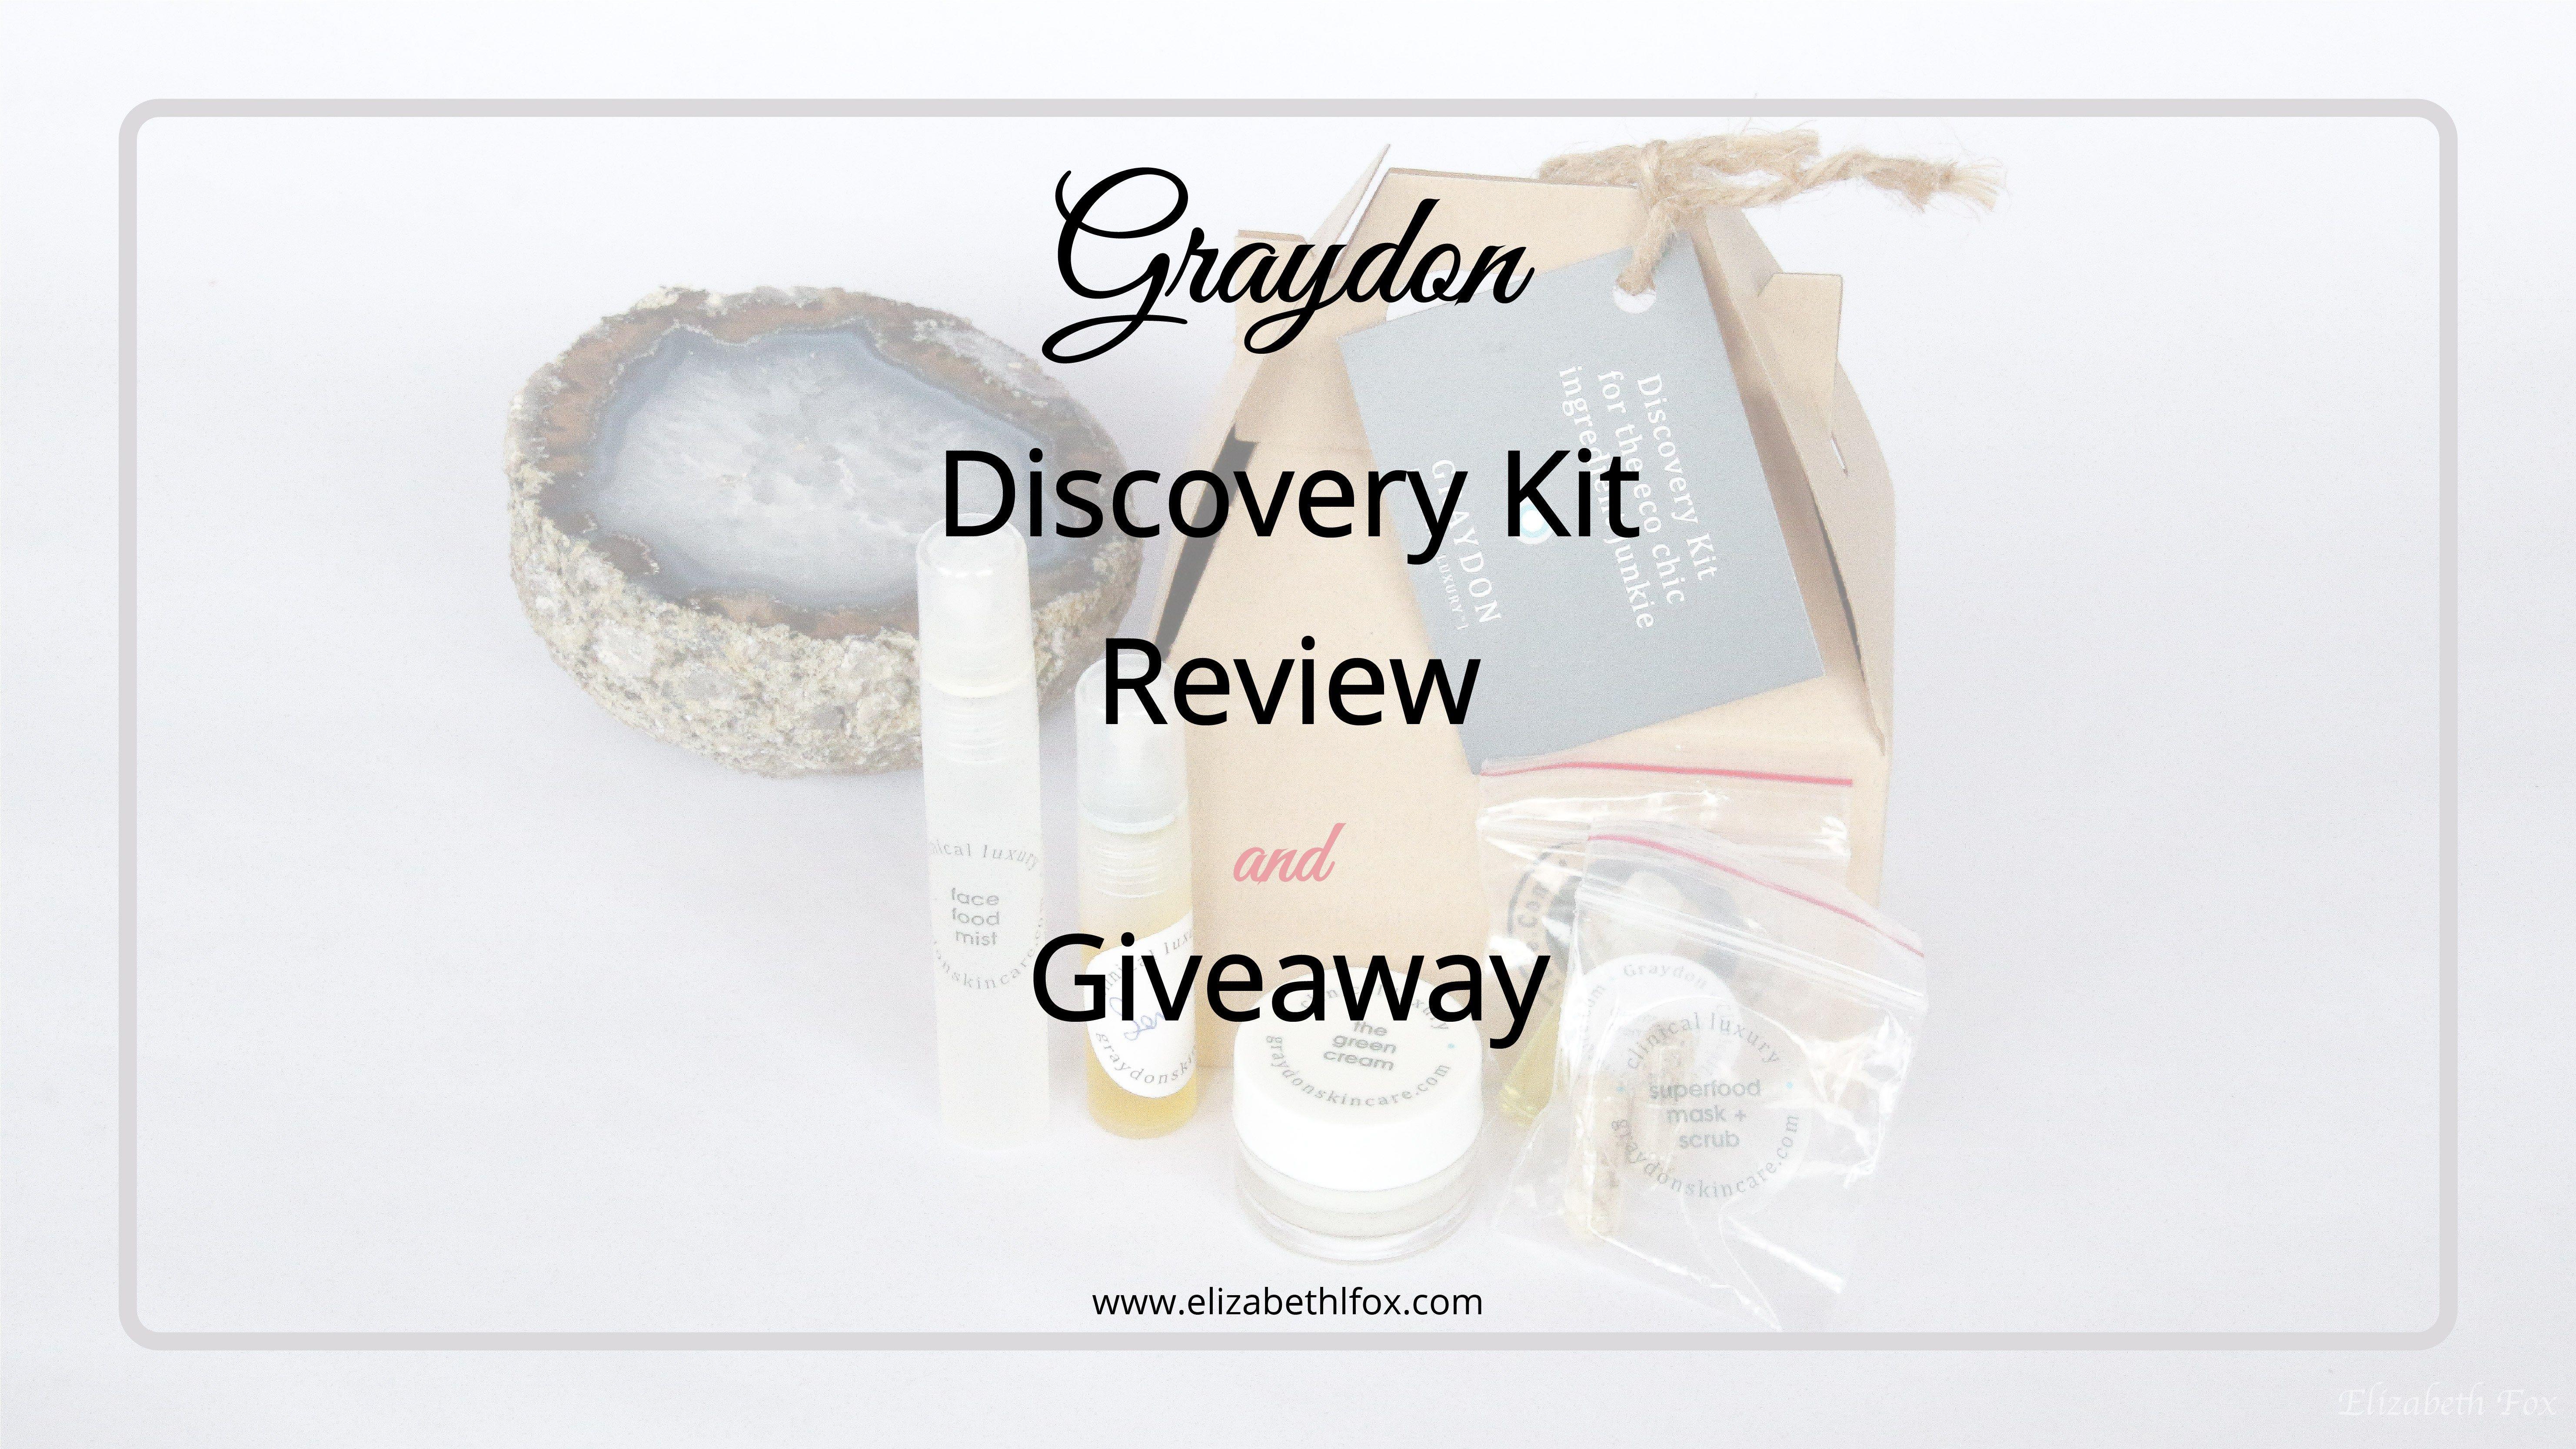 Graydon Discovery Kit Discovery kit, Giveaway, Kit